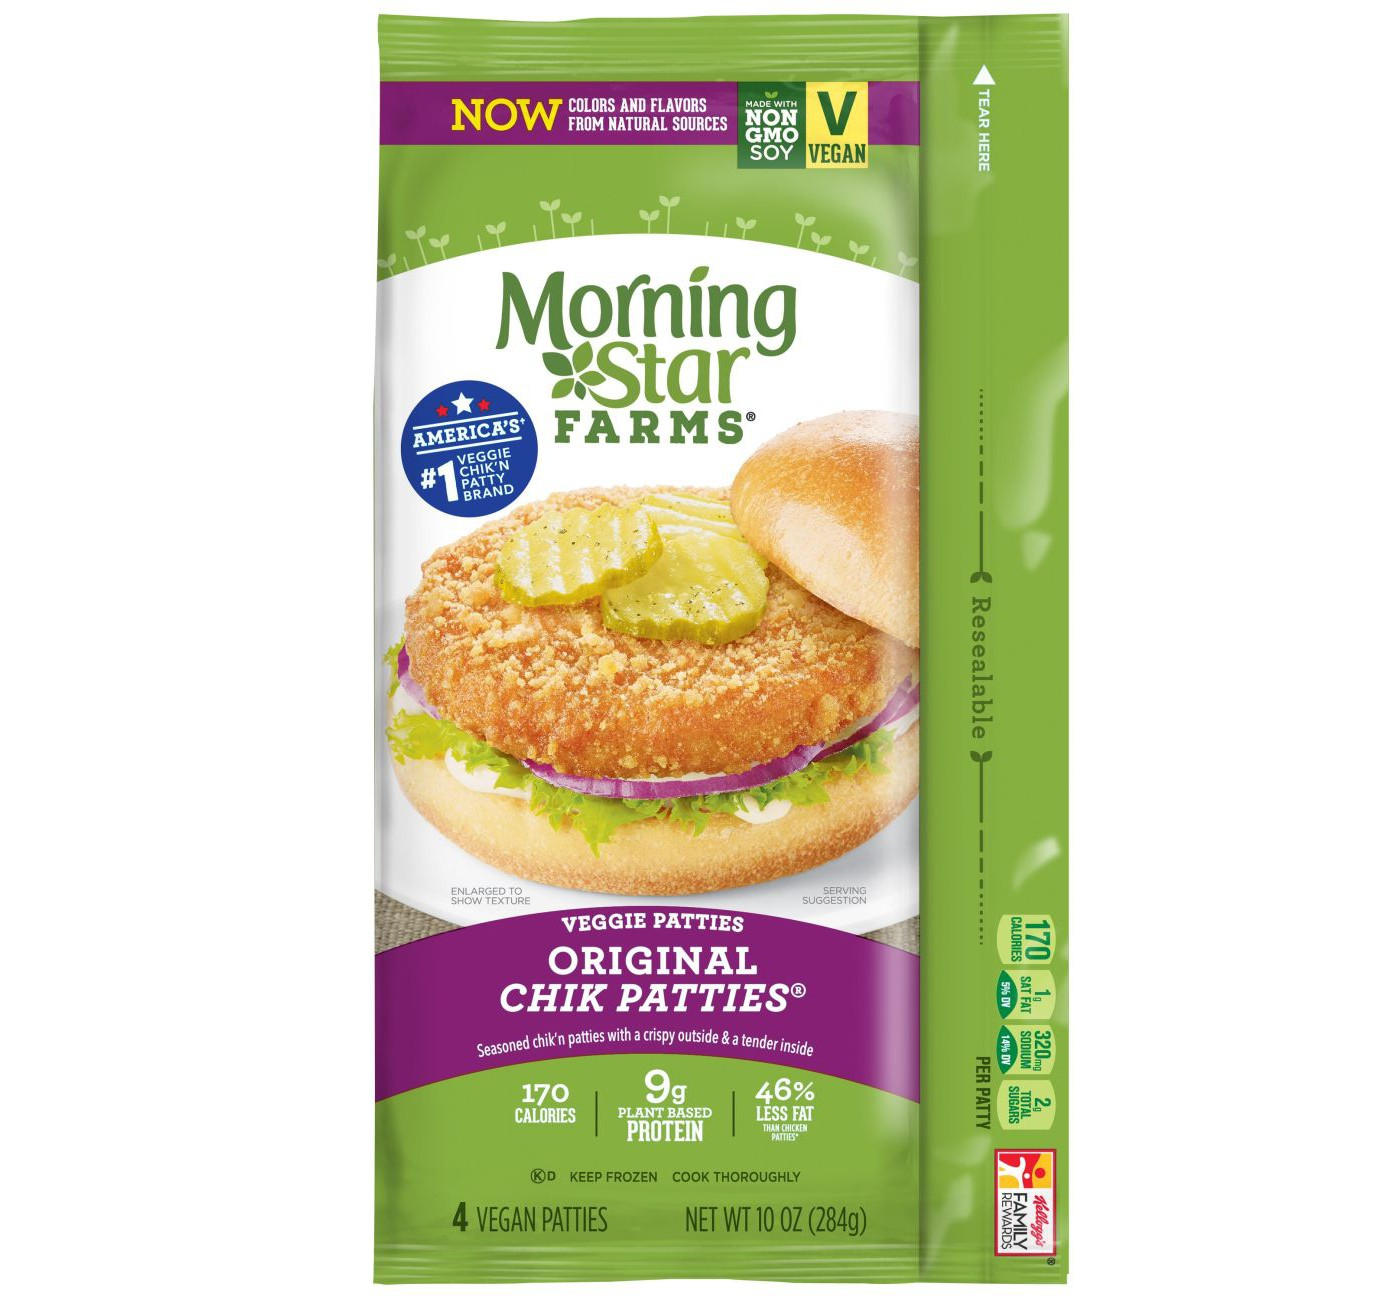 Morningstar Farms Original Frozen Chik Veggie Patties - 10oz - image 1 of 3